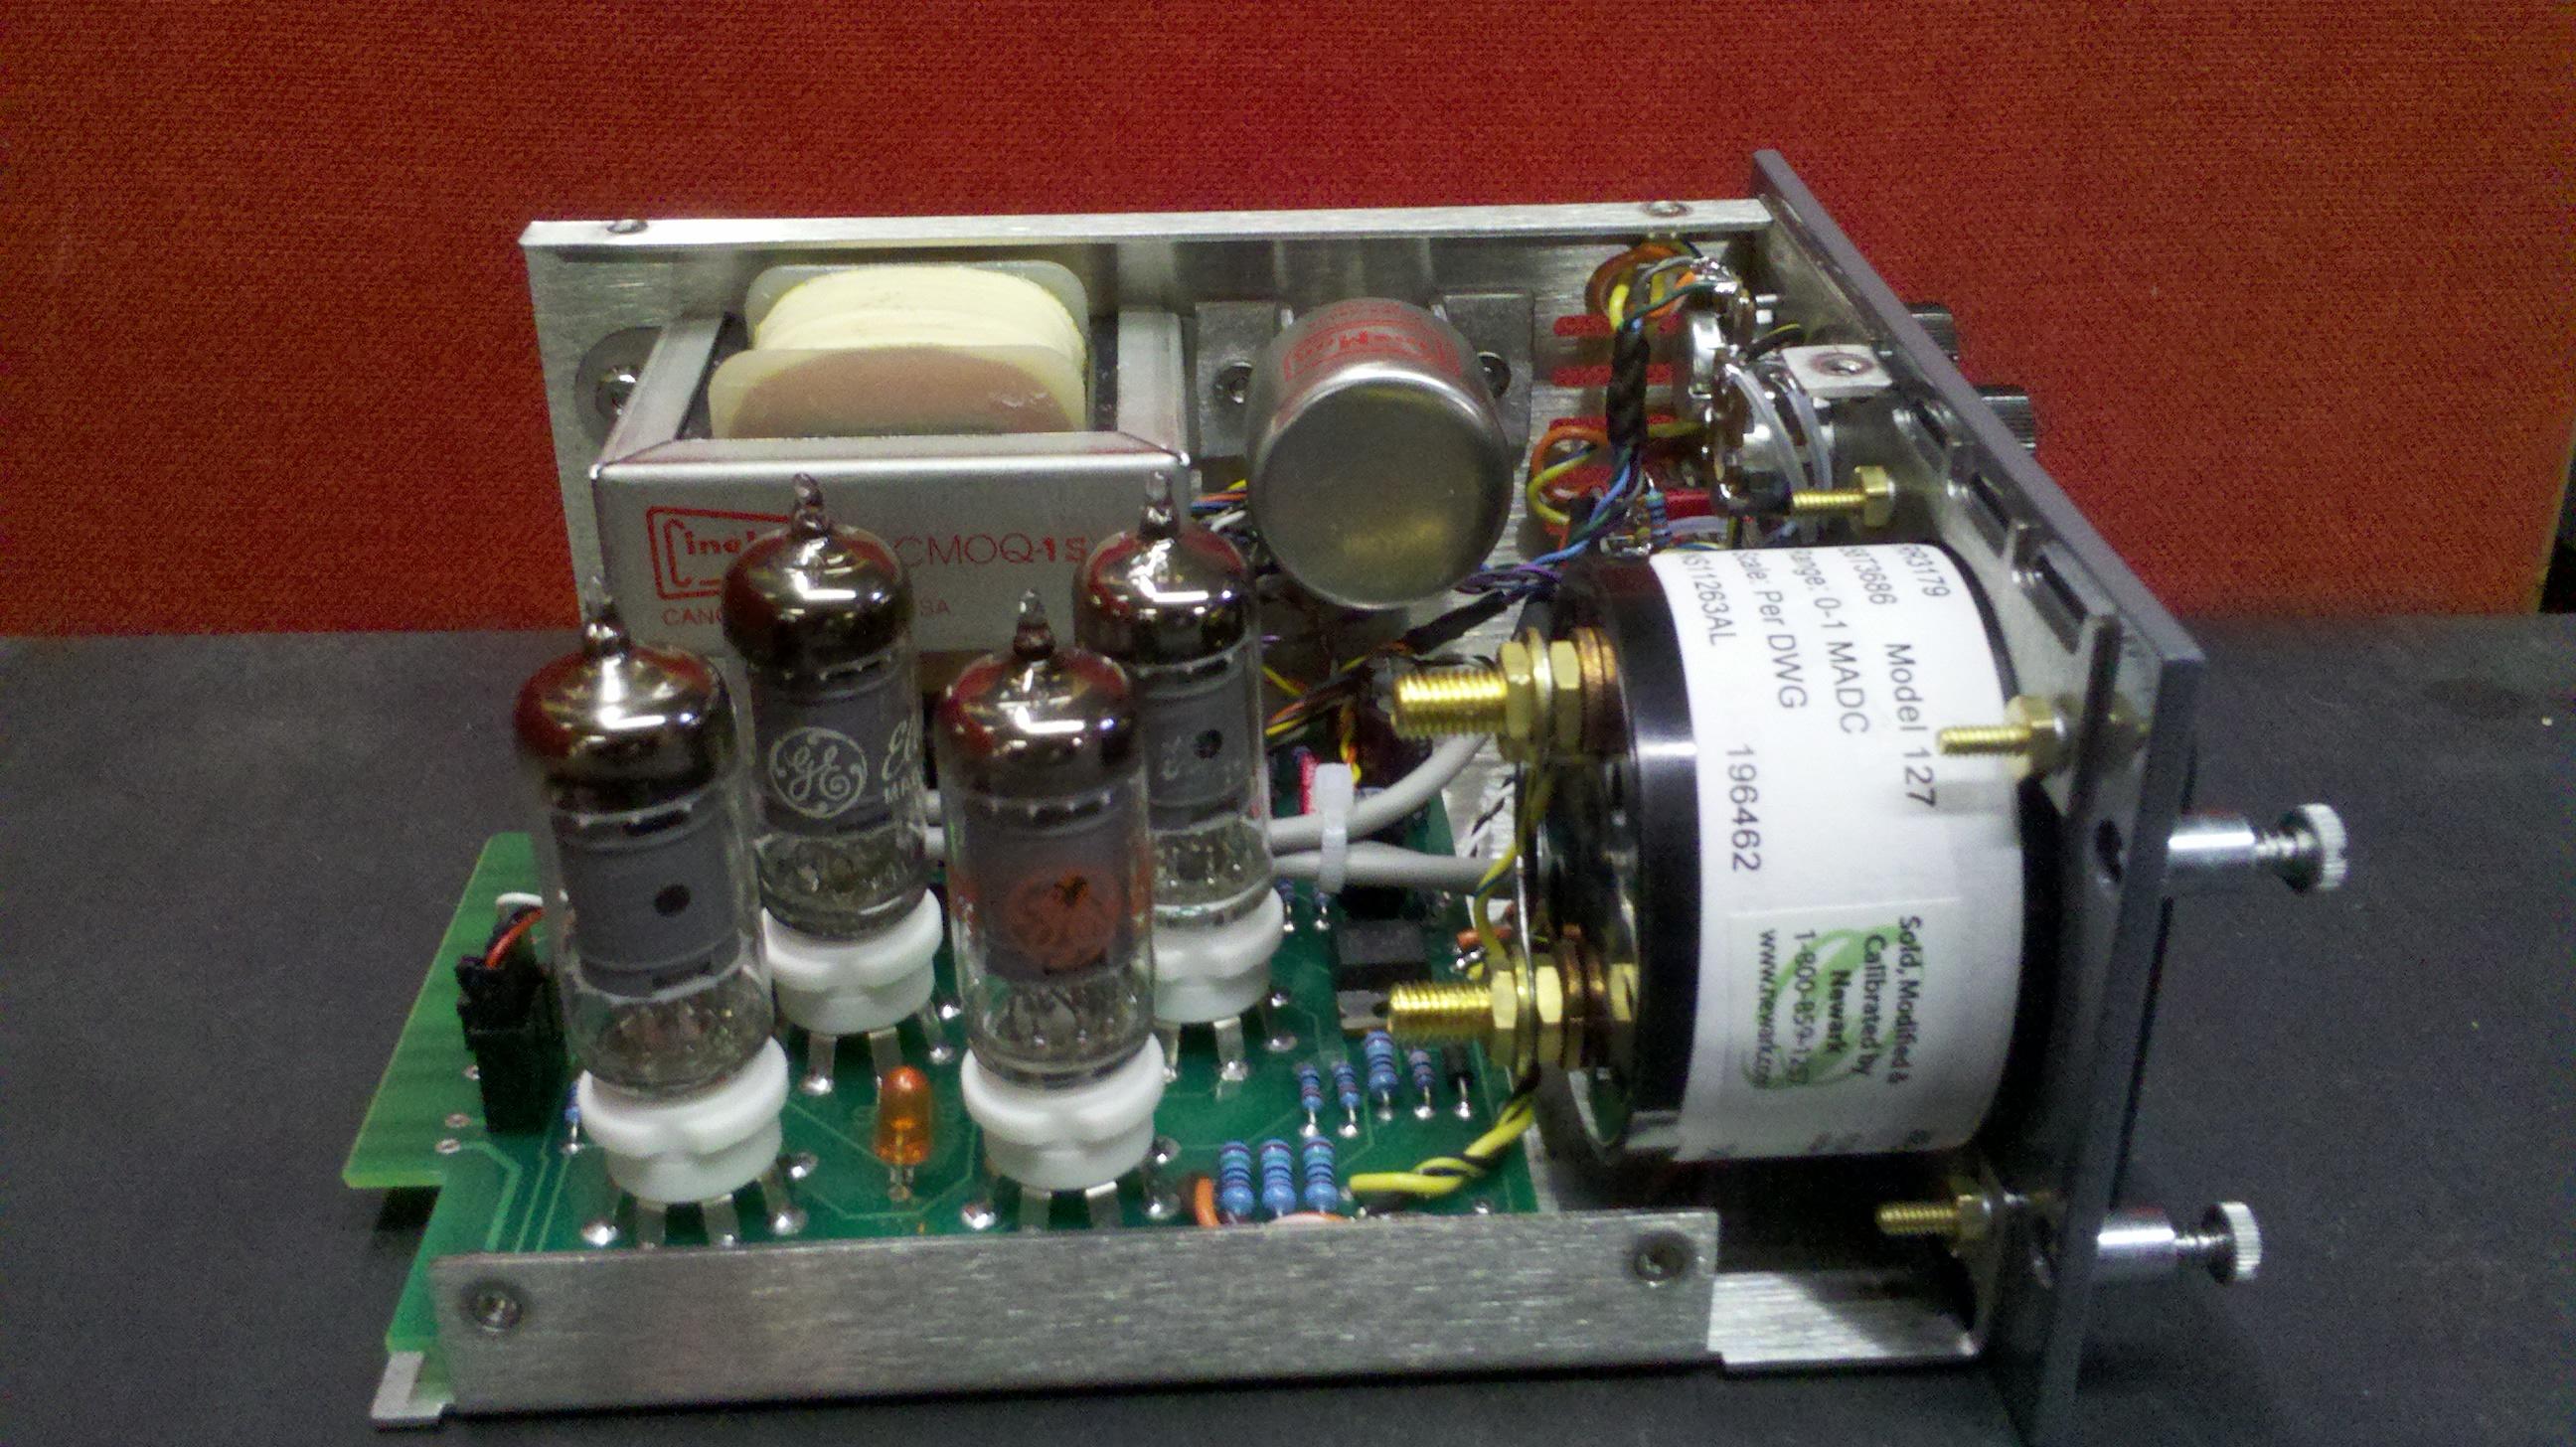 retro instruments 500 series compressor page 3 gearslutz pro audio community. Black Bedroom Furniture Sets. Home Design Ideas